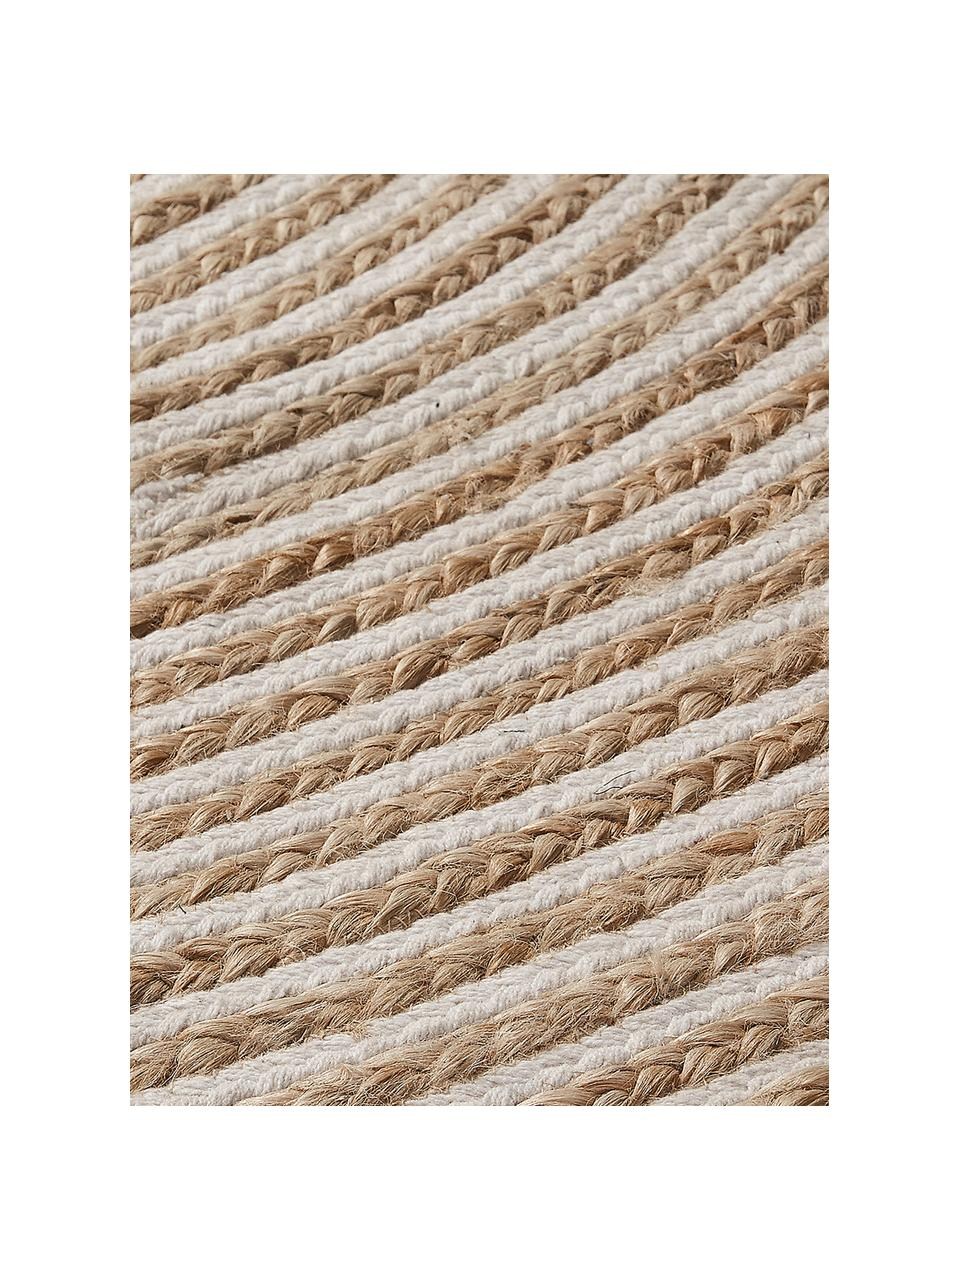 Tappeto rotondo in juta color beige/bianco con motivo a spirale Samy, 60% juta, 40% cotone, Juta, bianco latteo, Ø 150 cm (taglia M)